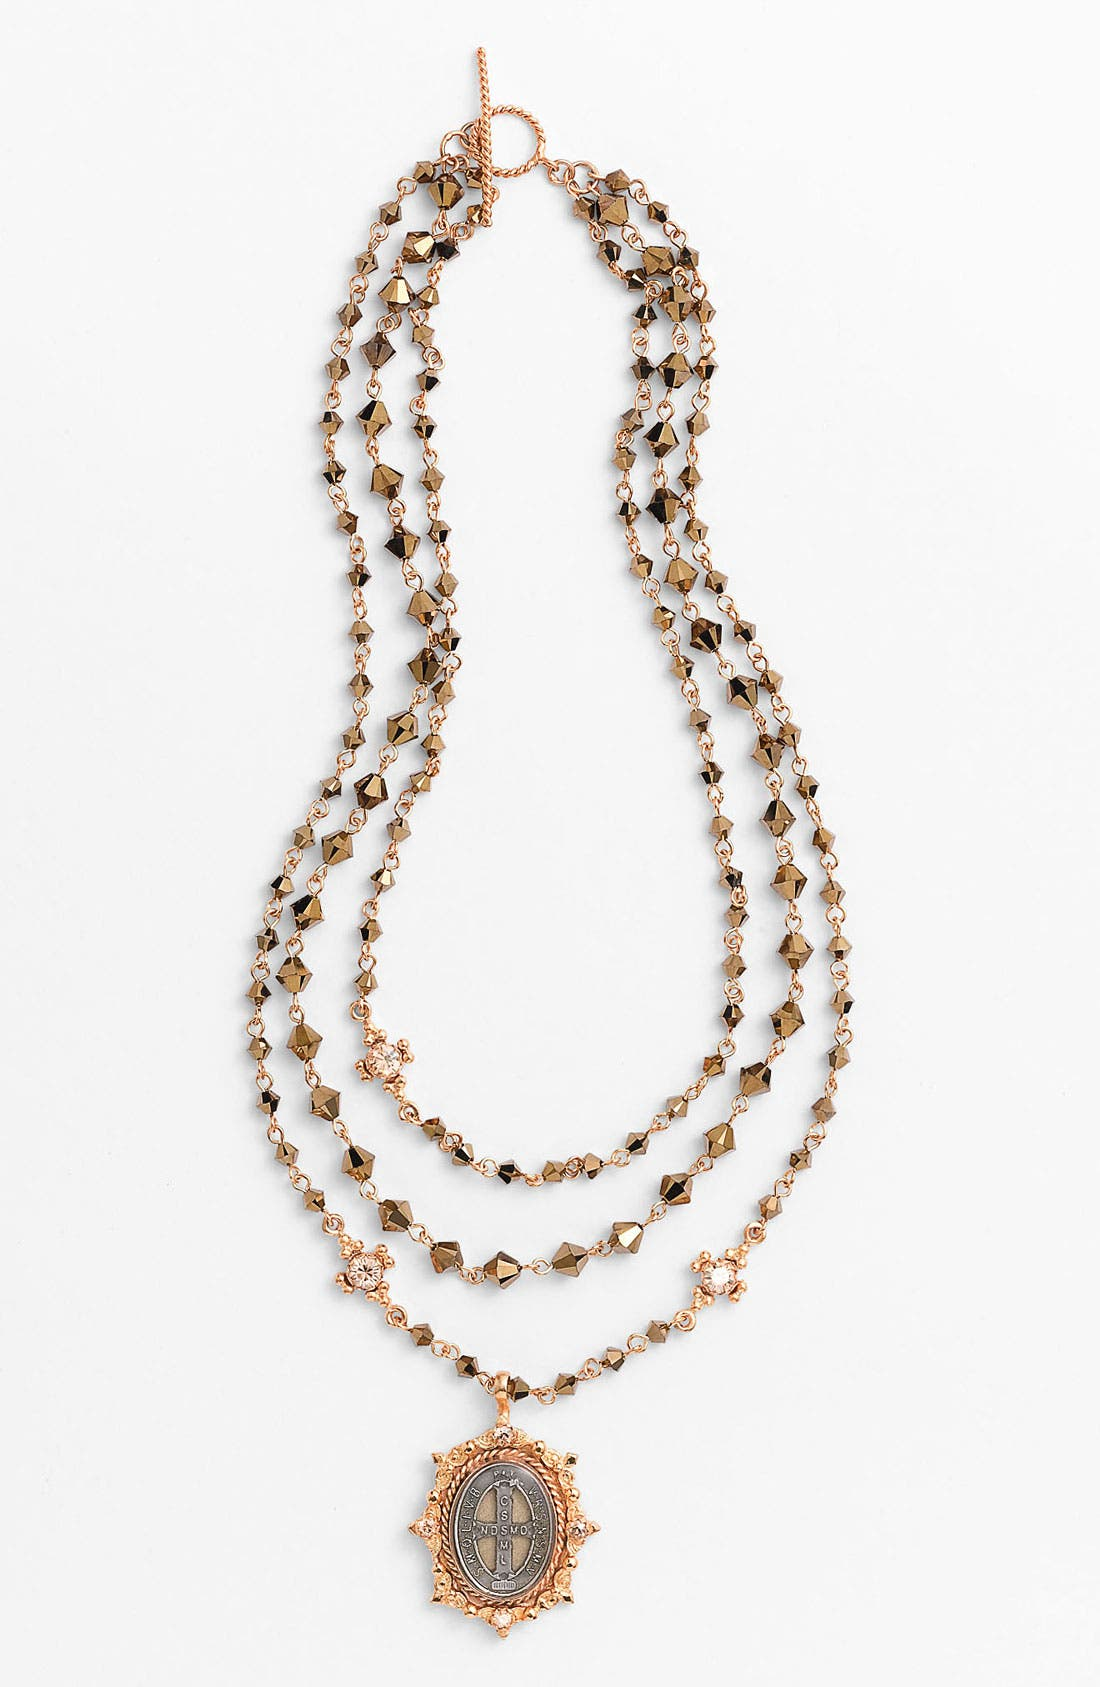 Alternate Image 1 Selected - Virgins Saints & Angels 'Oval Magdalena' Necklace (Nordstrom Exclusive)